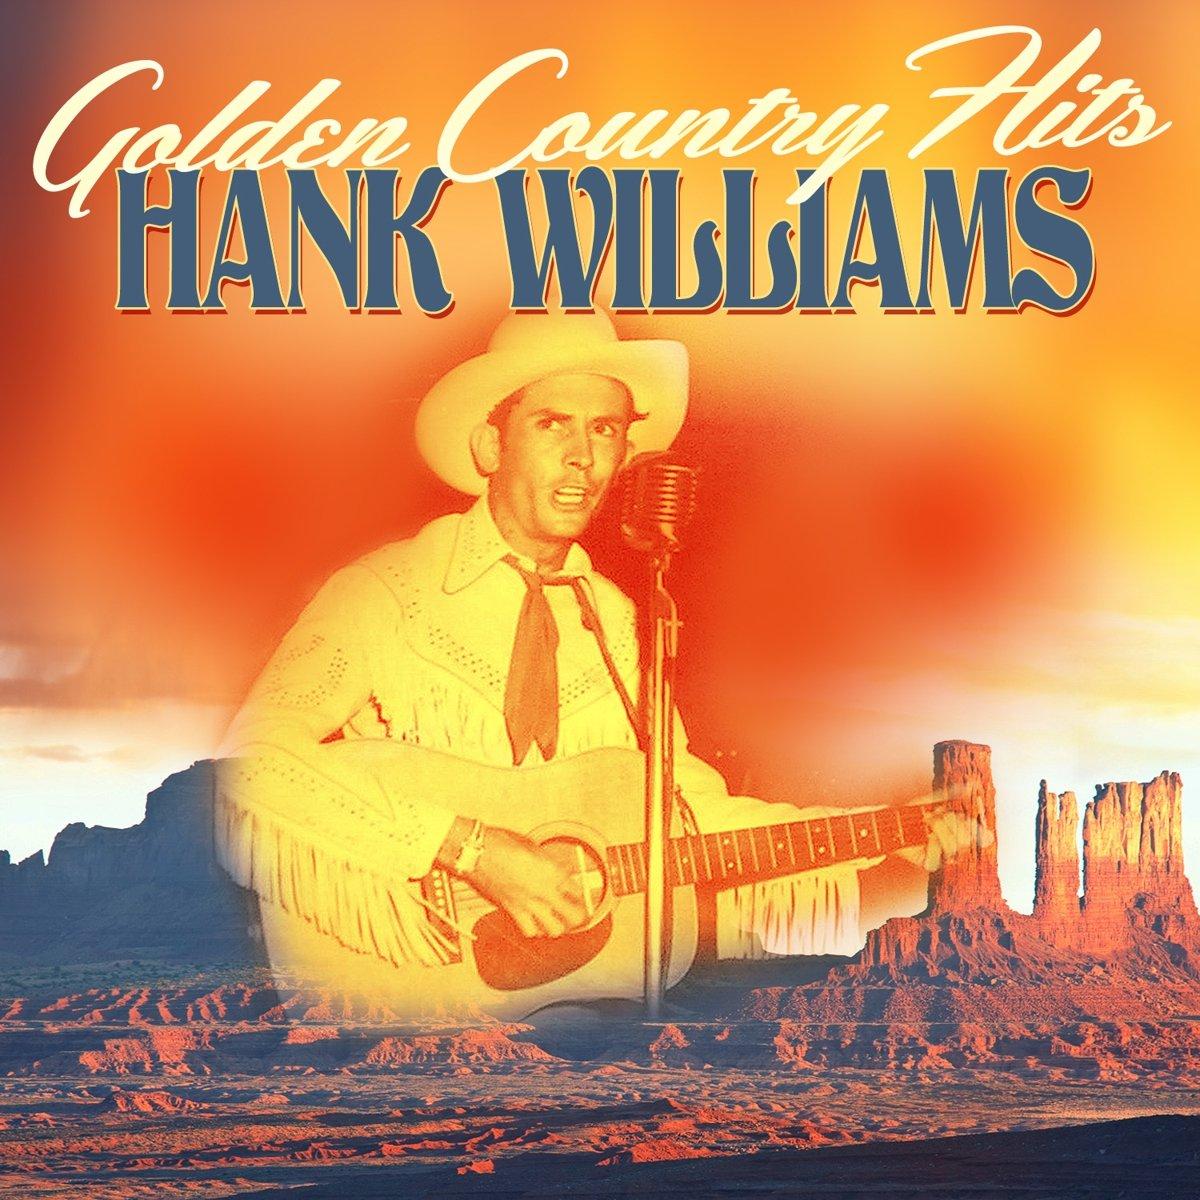 Хэнк Уильямс-младший Hank Williams. Golden Country Hits (2 CD) рой орбисон хэнк уильямс старший roy orbison the mgm years 13 cd